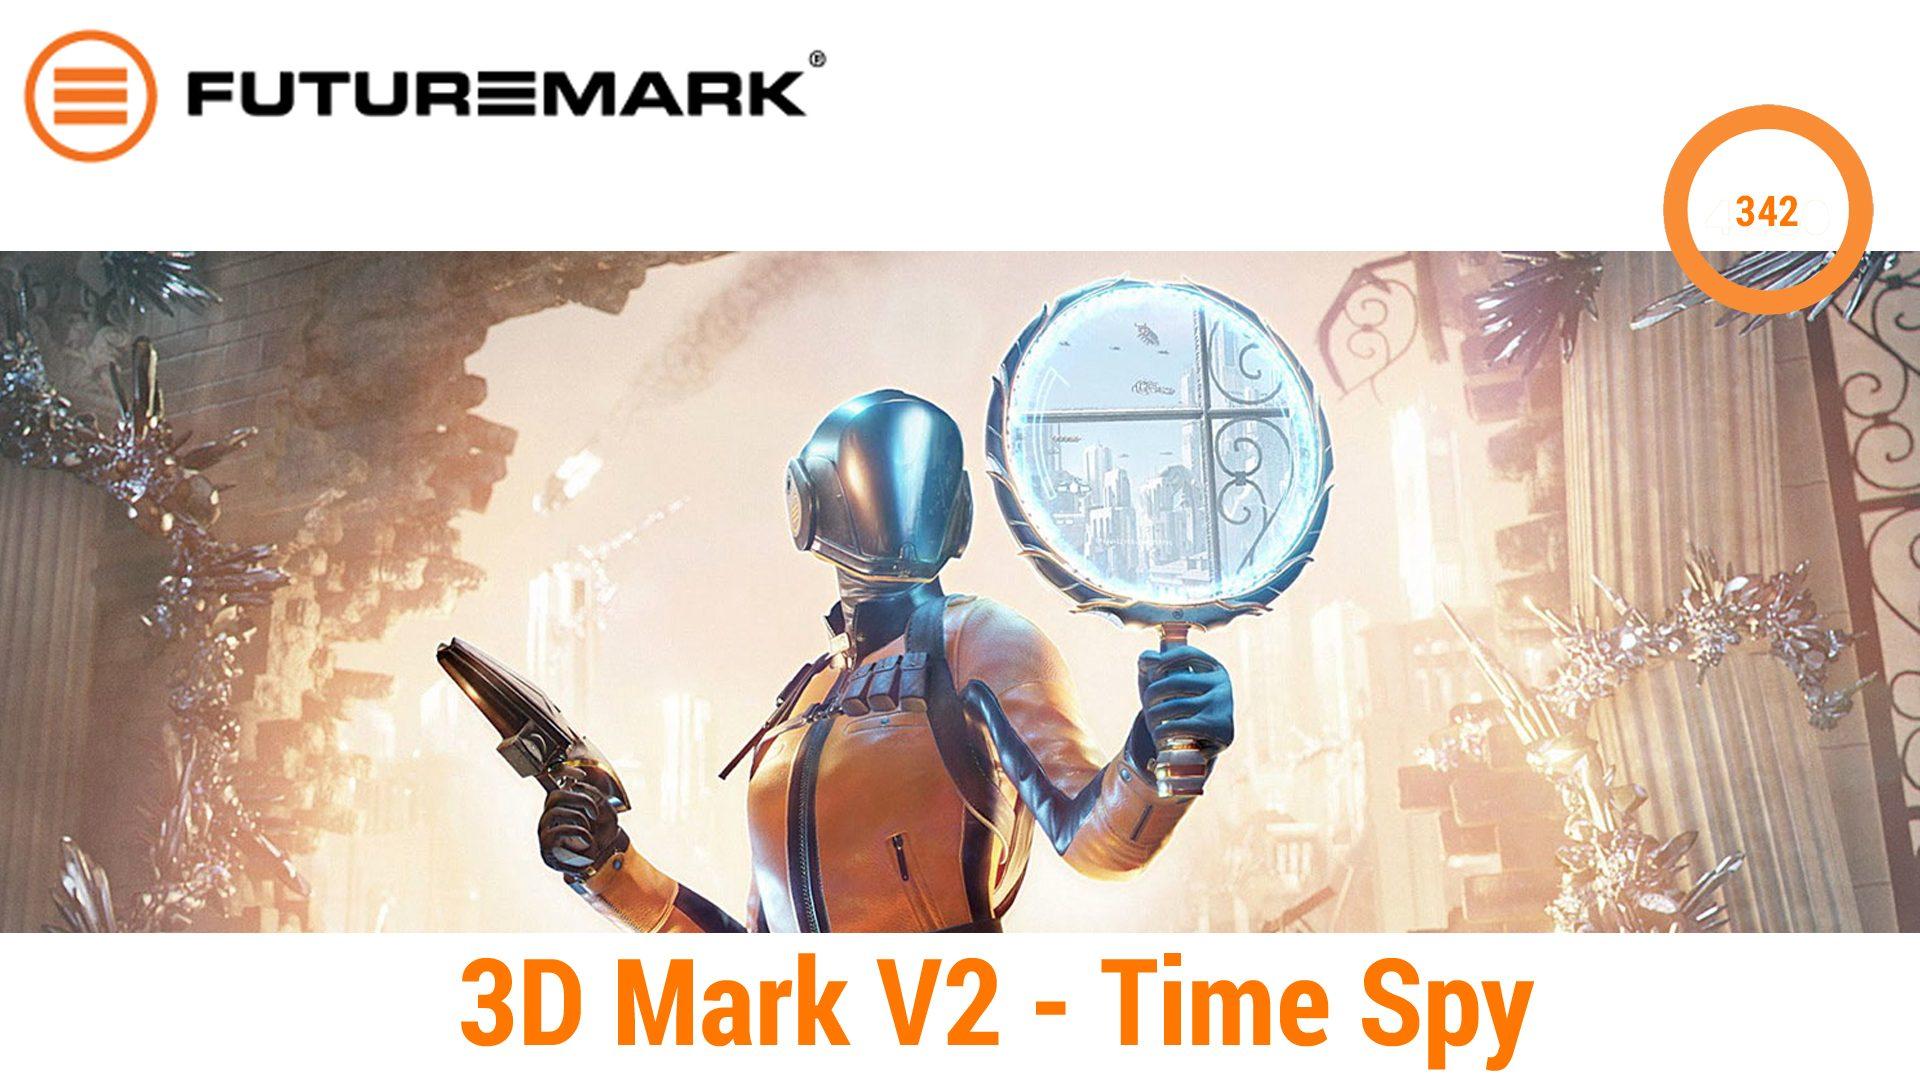 HP-Spectre-x360-OLED-13-4203ng-Grafik_5